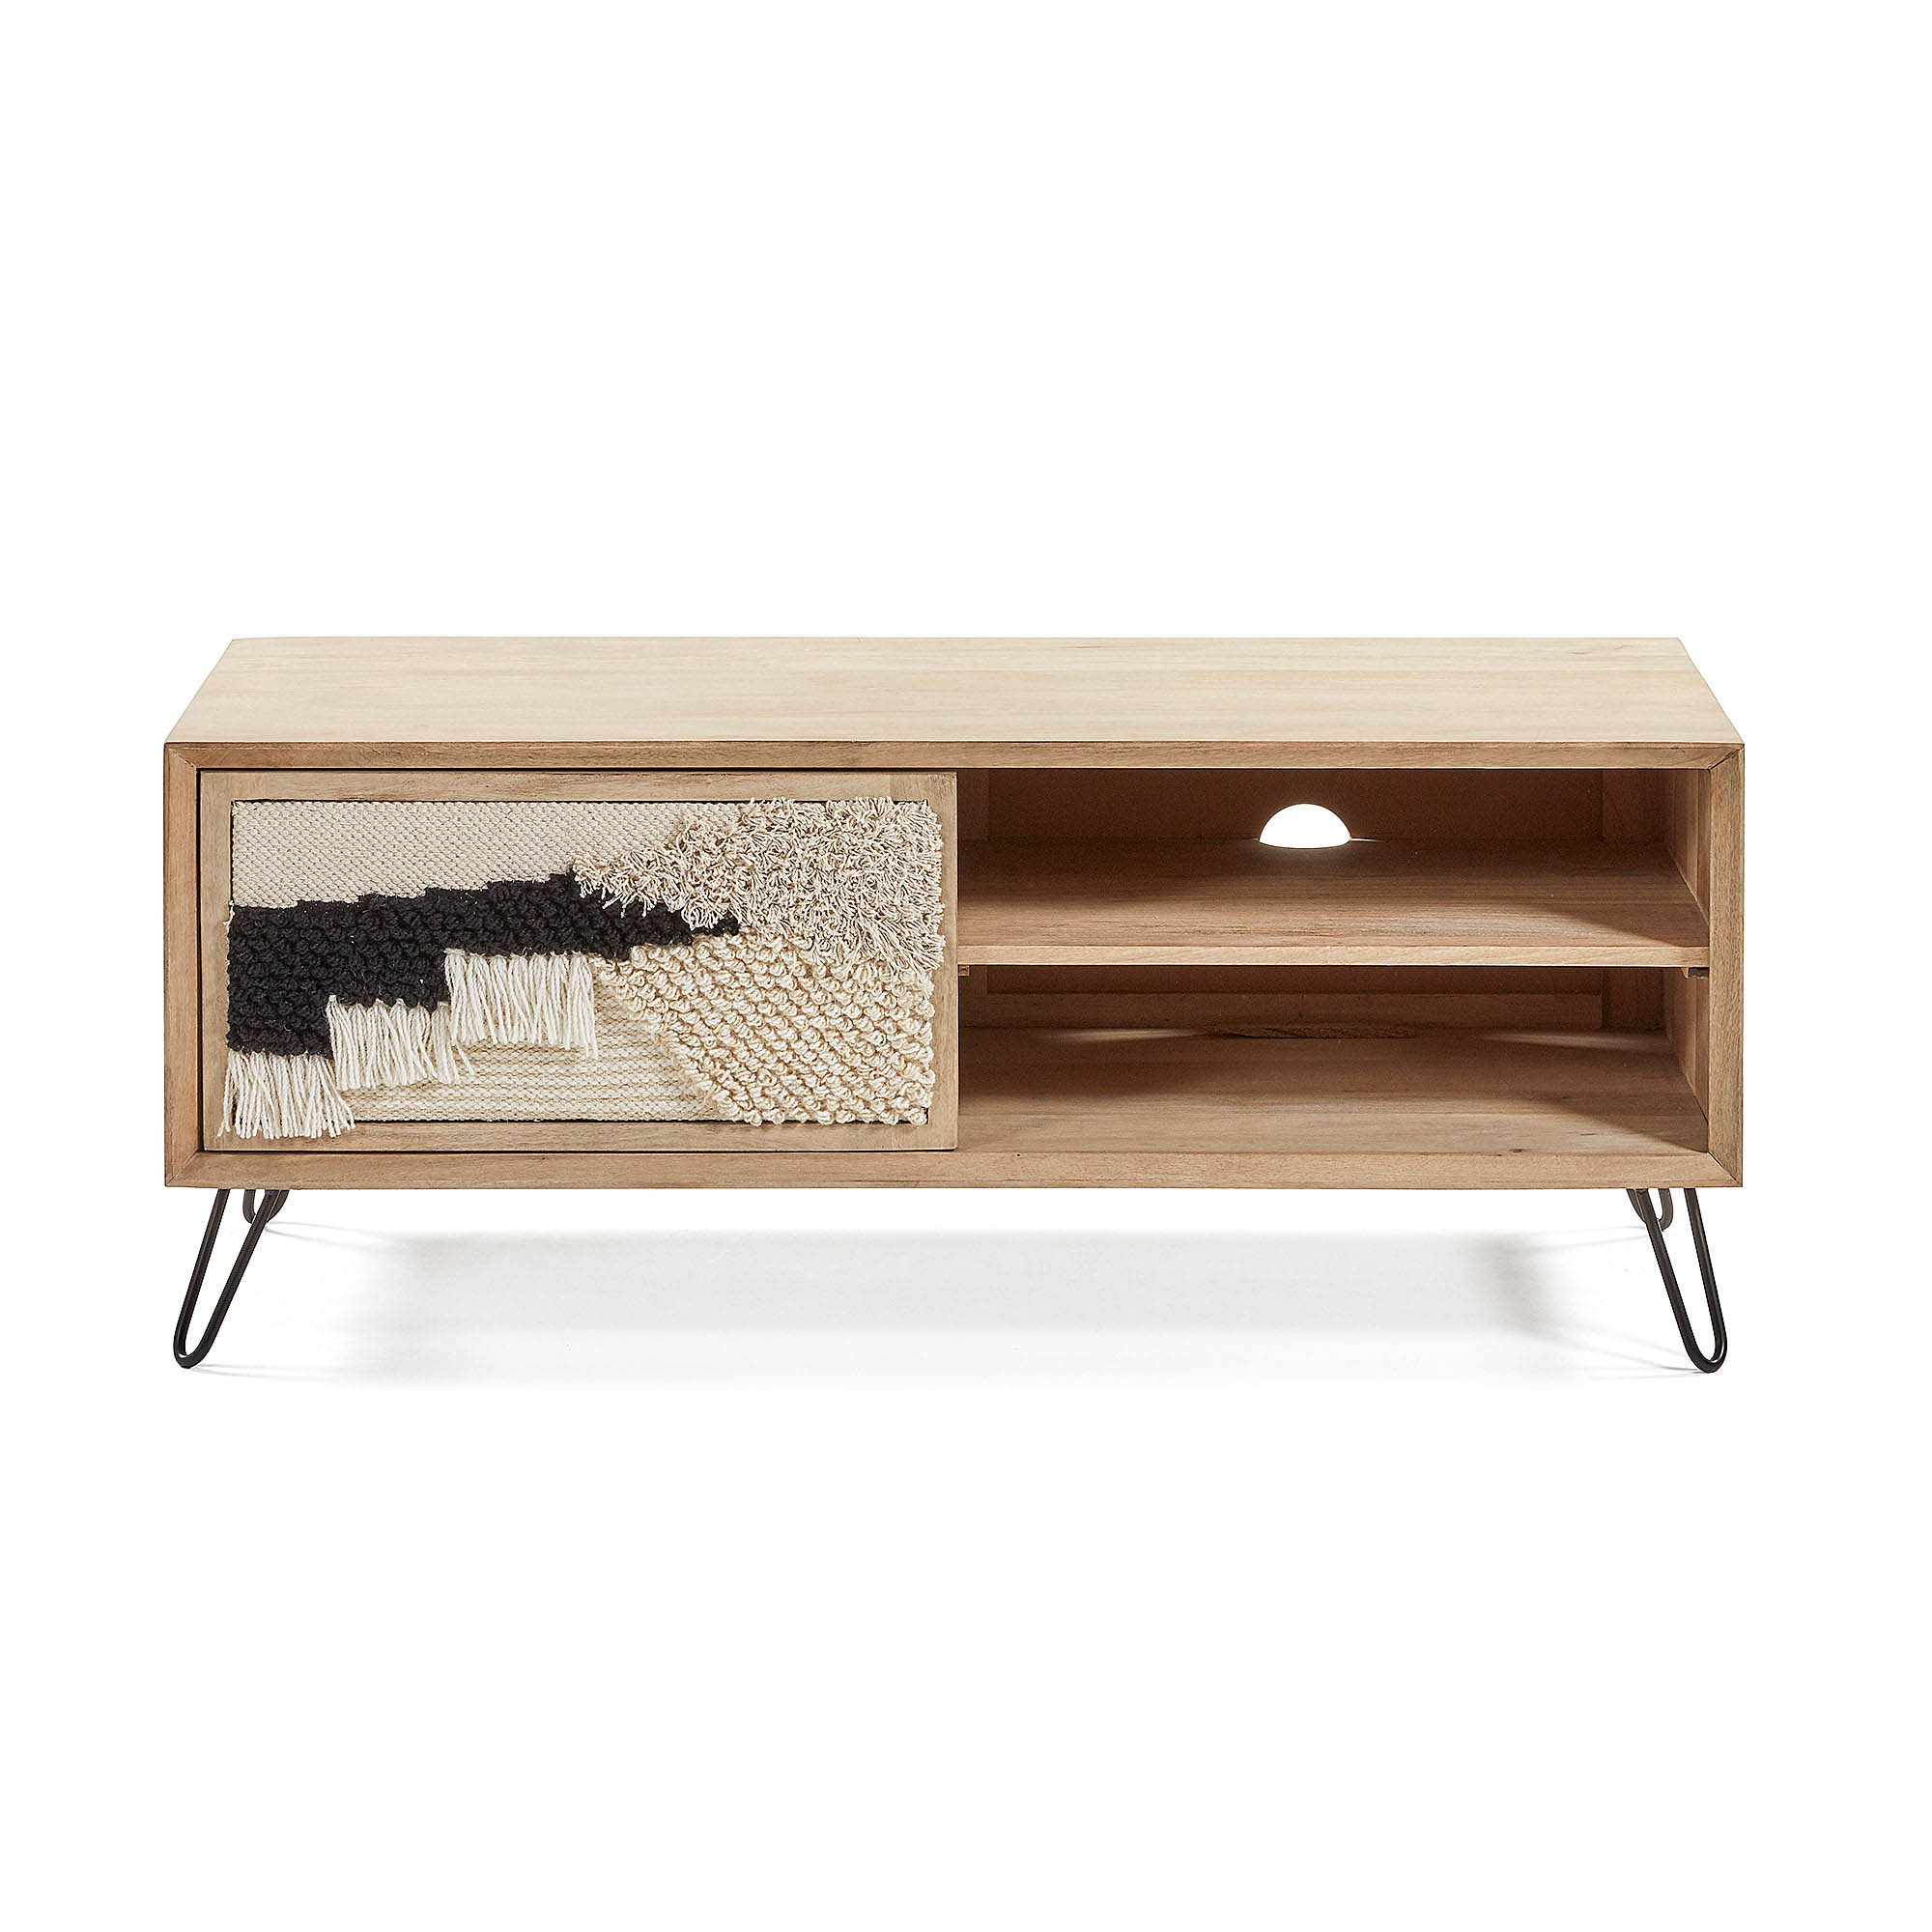 LAFORMA rektangulær Kenelly TV-bord m. 1 låge - natur mangotræ, beige og sort stof og metal